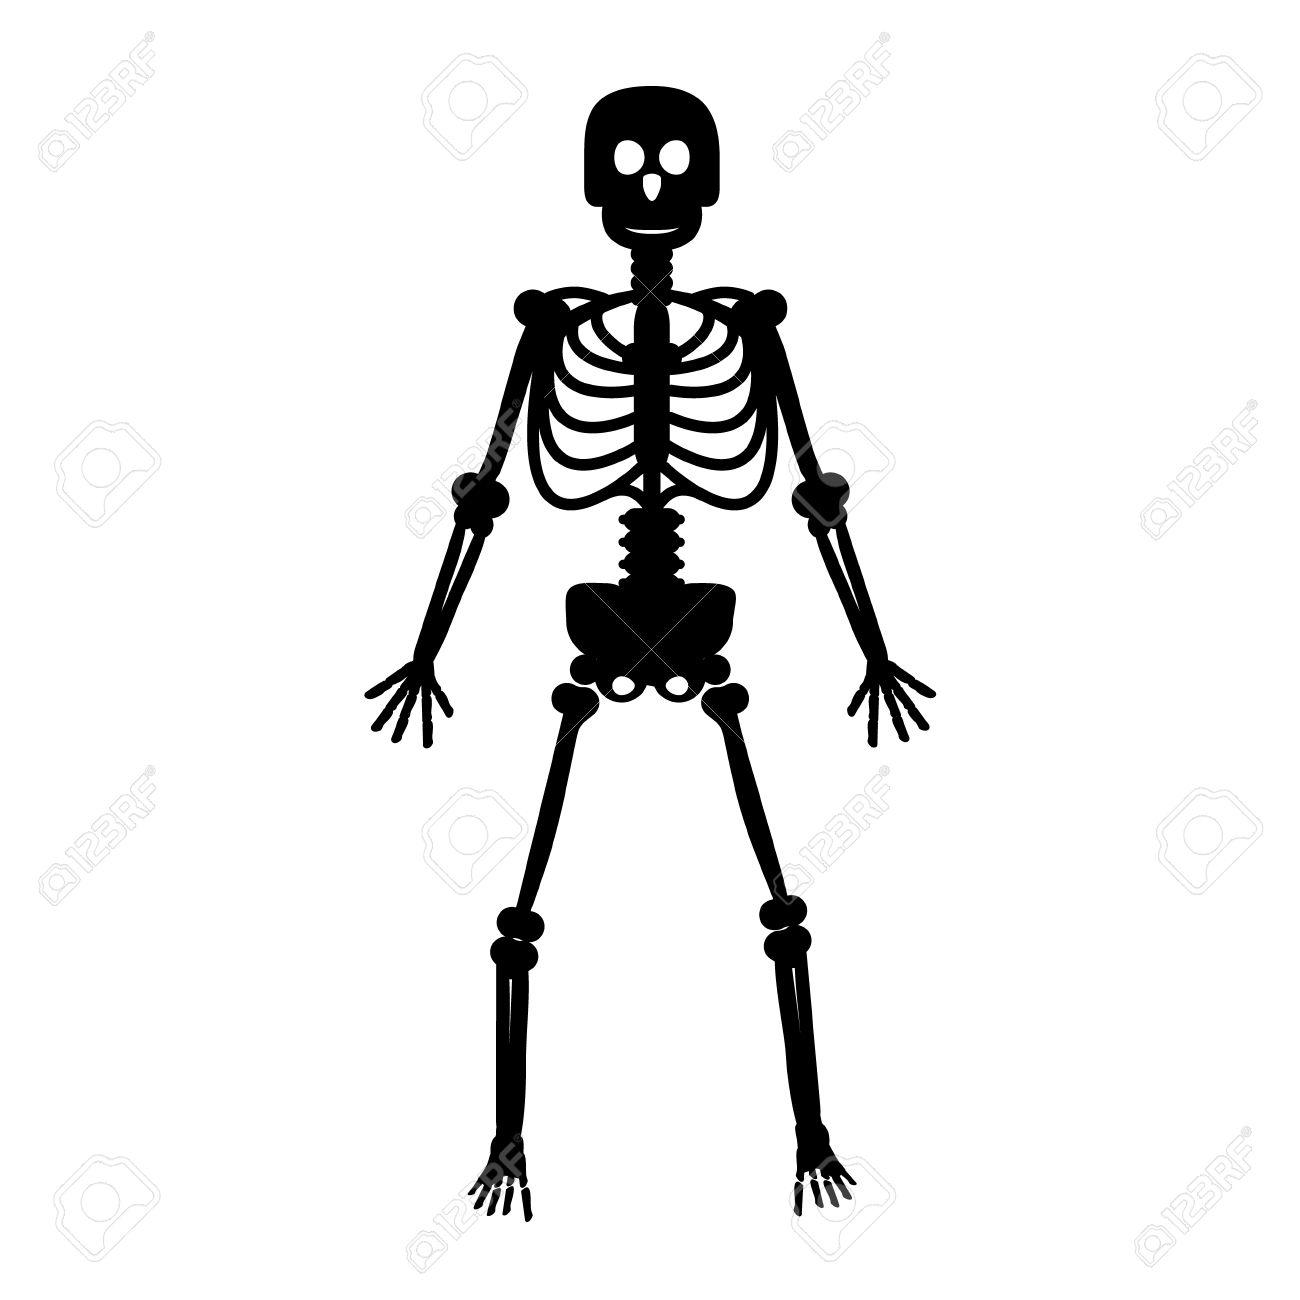 skeleton black human bones on white background vector royalty free rh 123rf com skeleton vector free download skeleton vector image